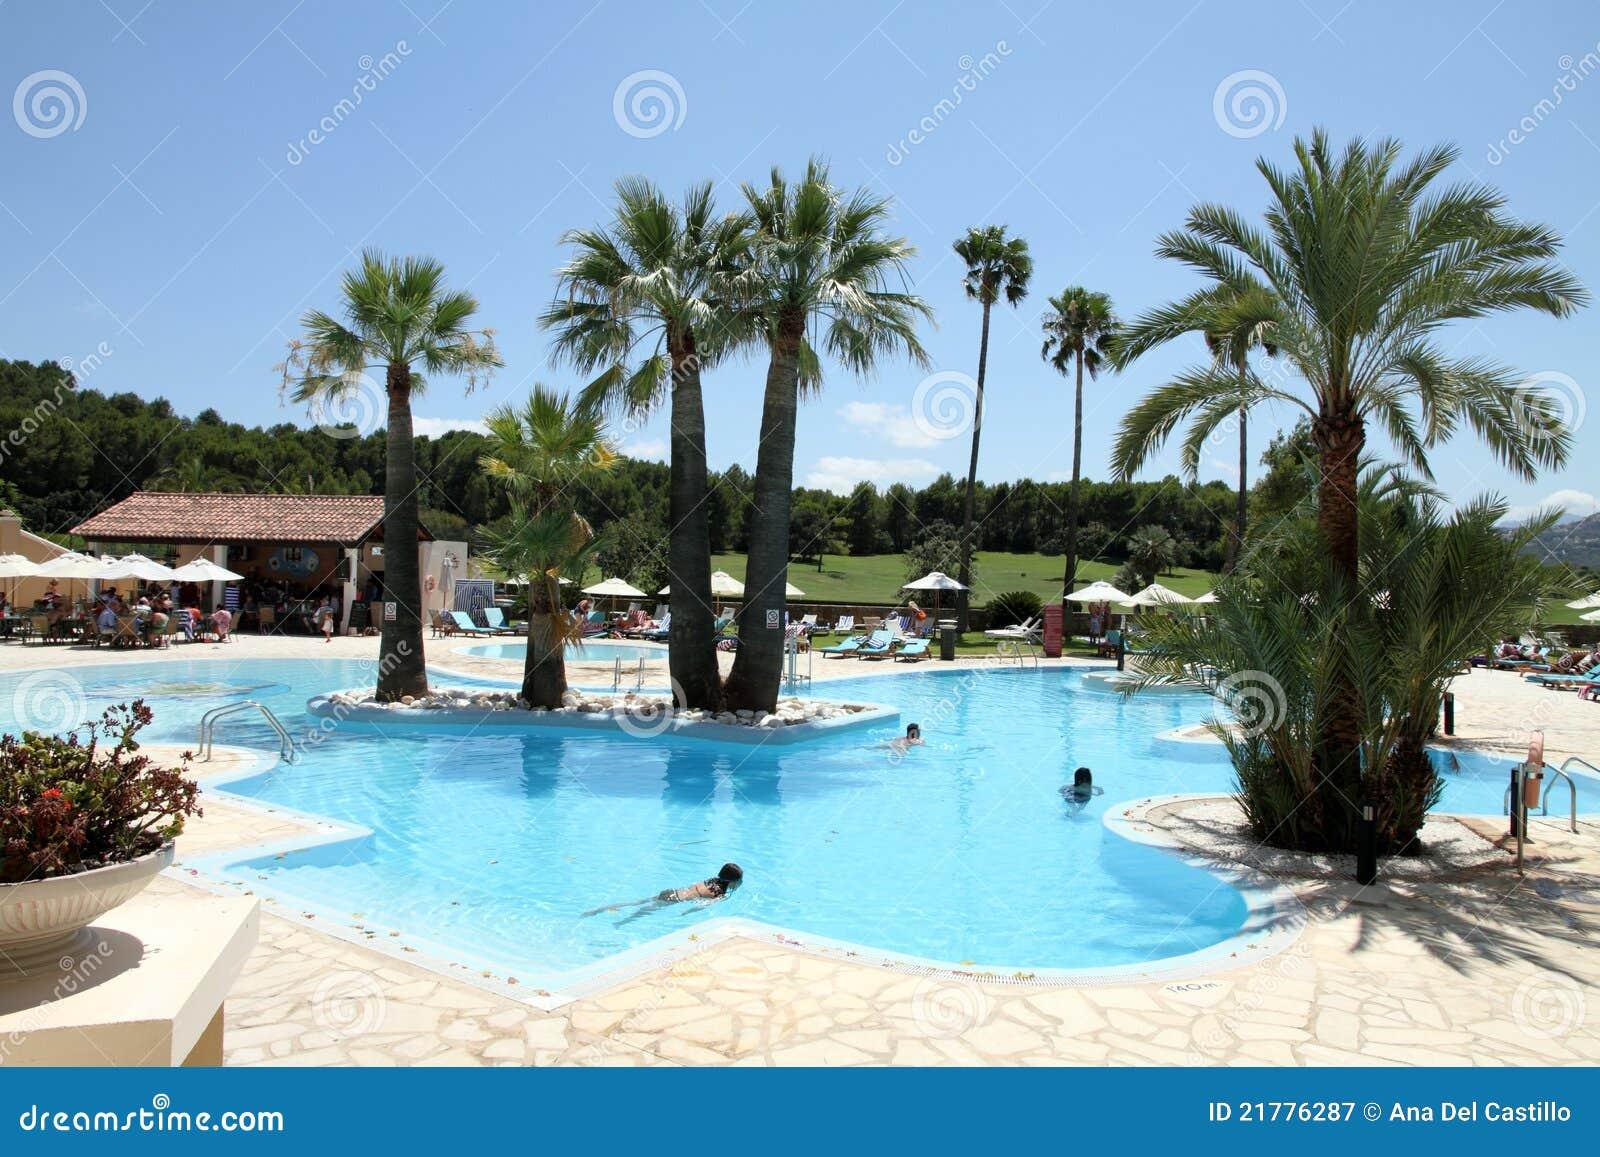 Swimming pool resort denia alicante spain stock image - Hotels in madrid spain with swimming pool ...